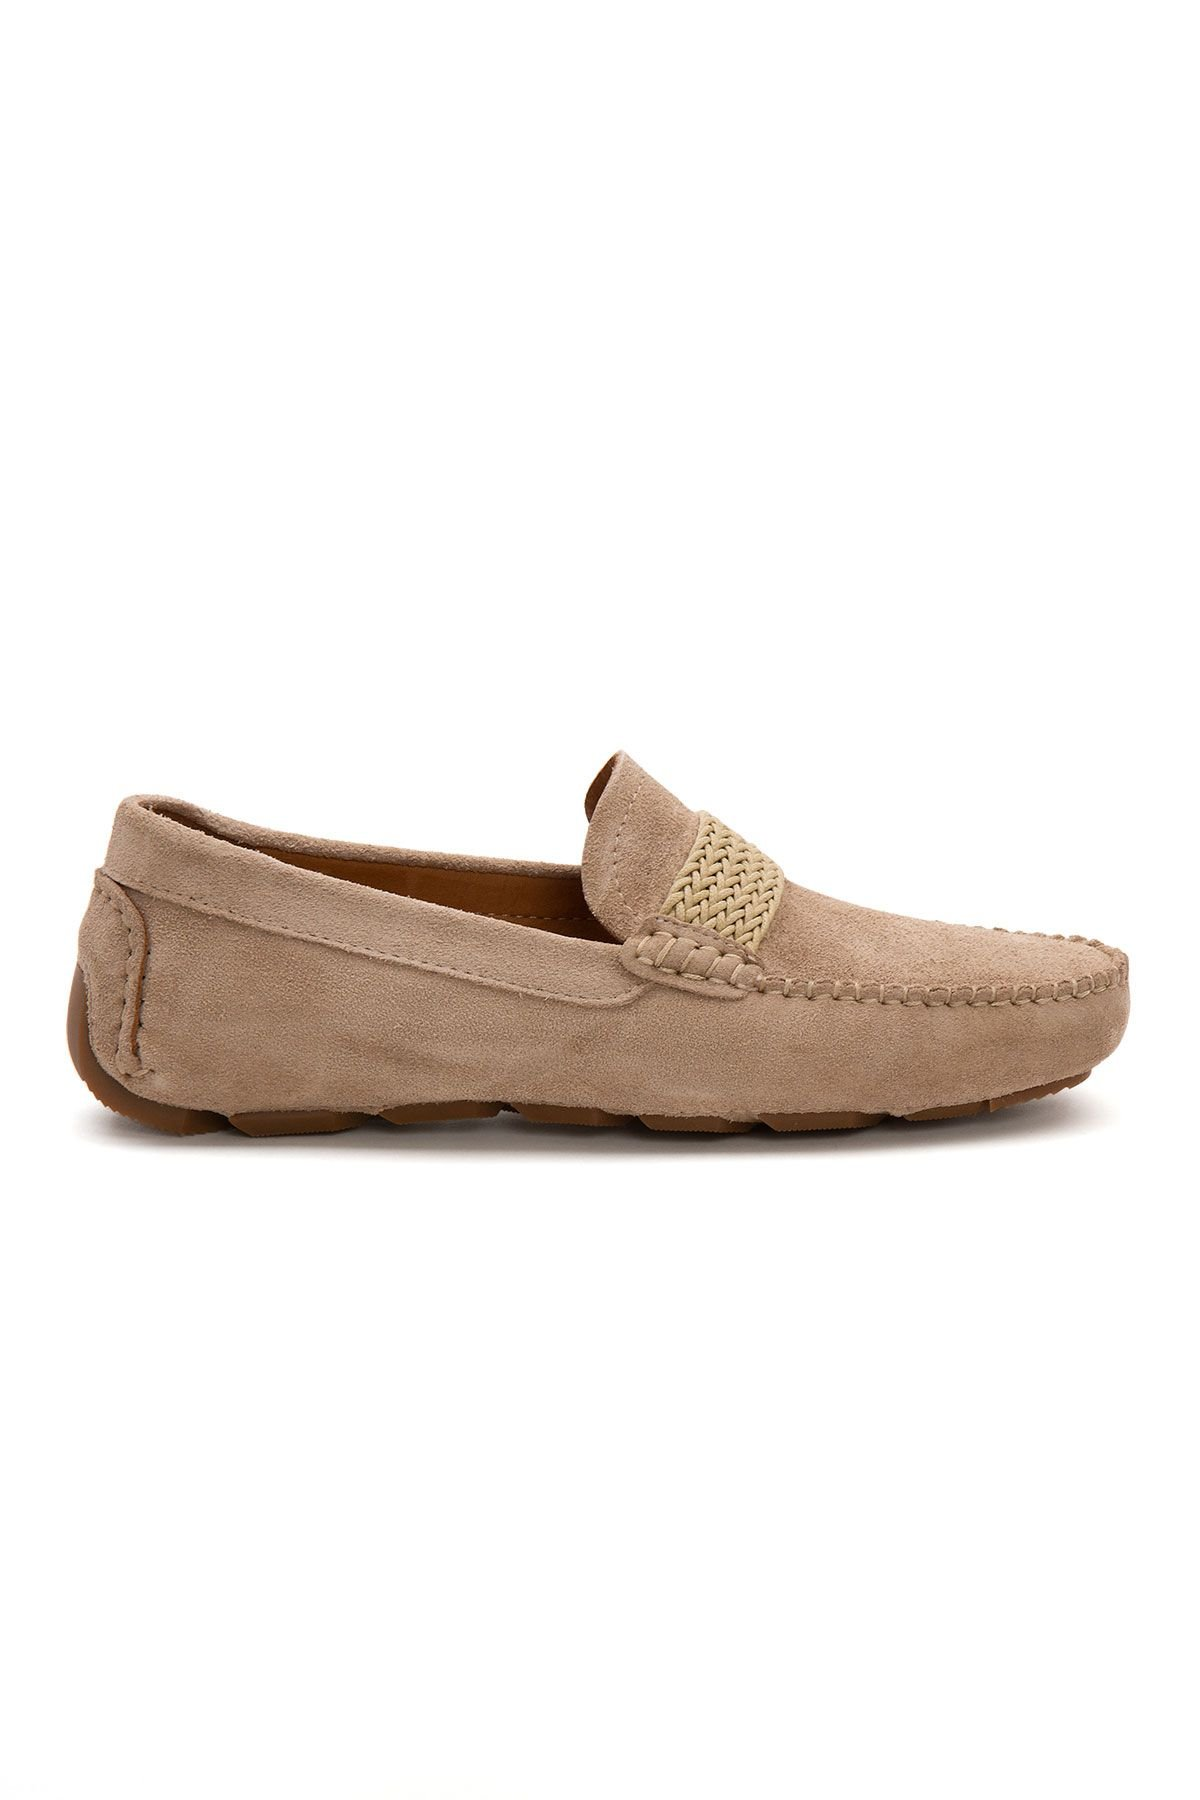 Pegia Genuine Suede Men's Loafer Shoes 500904 Beige